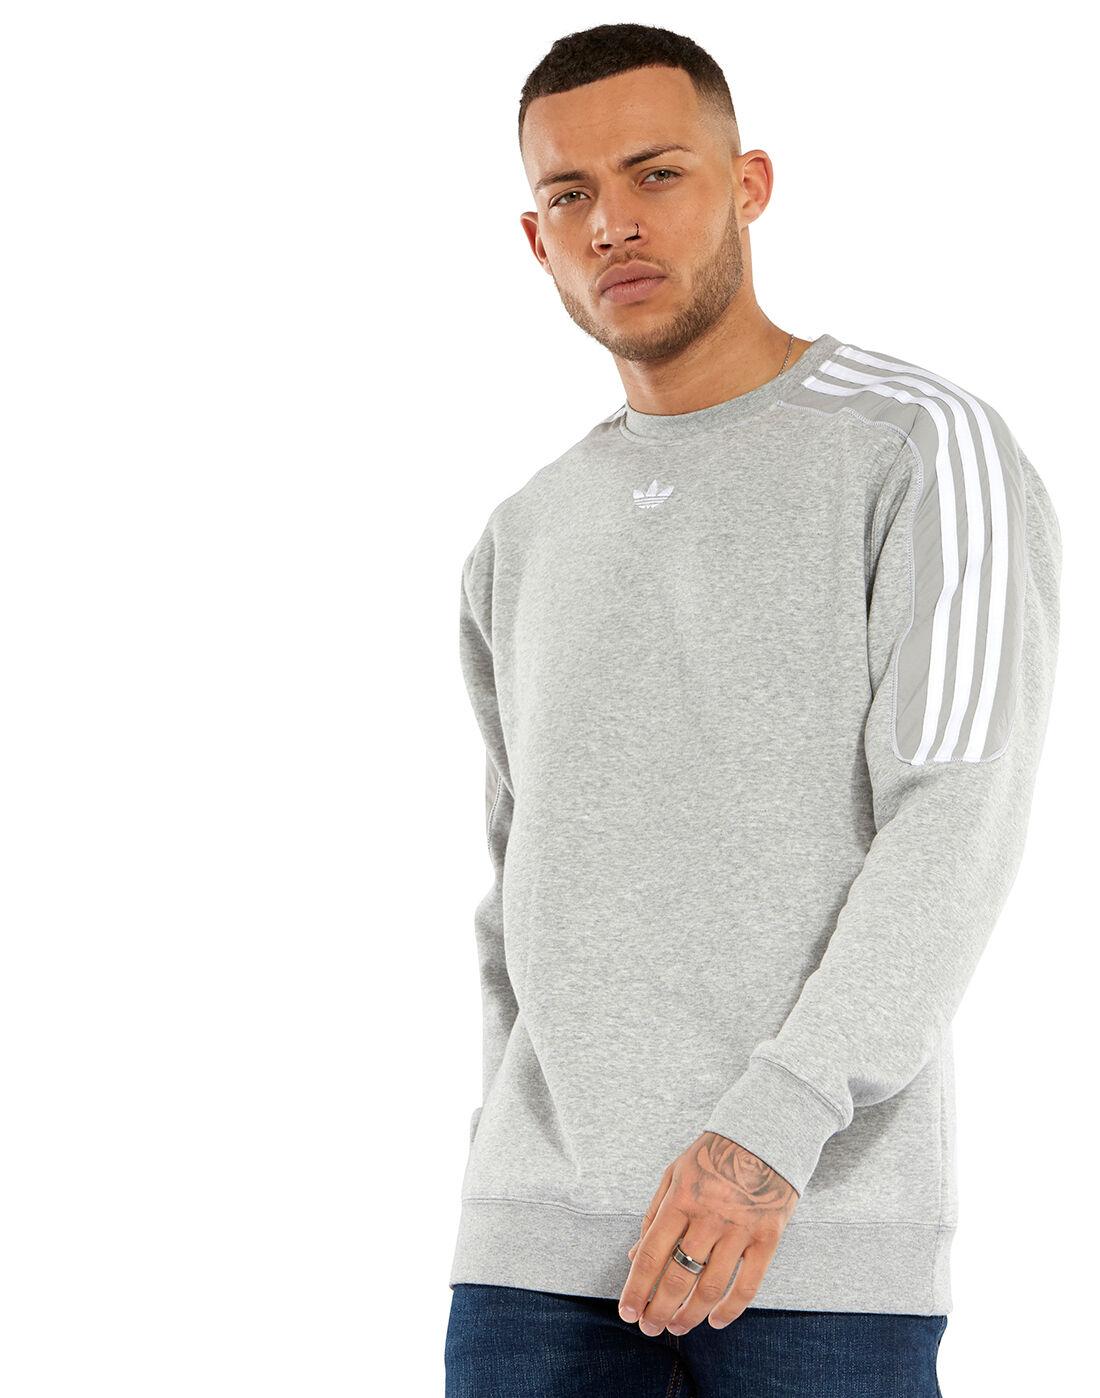 adidas Originals Mens Radkin Crew Sweatshirt